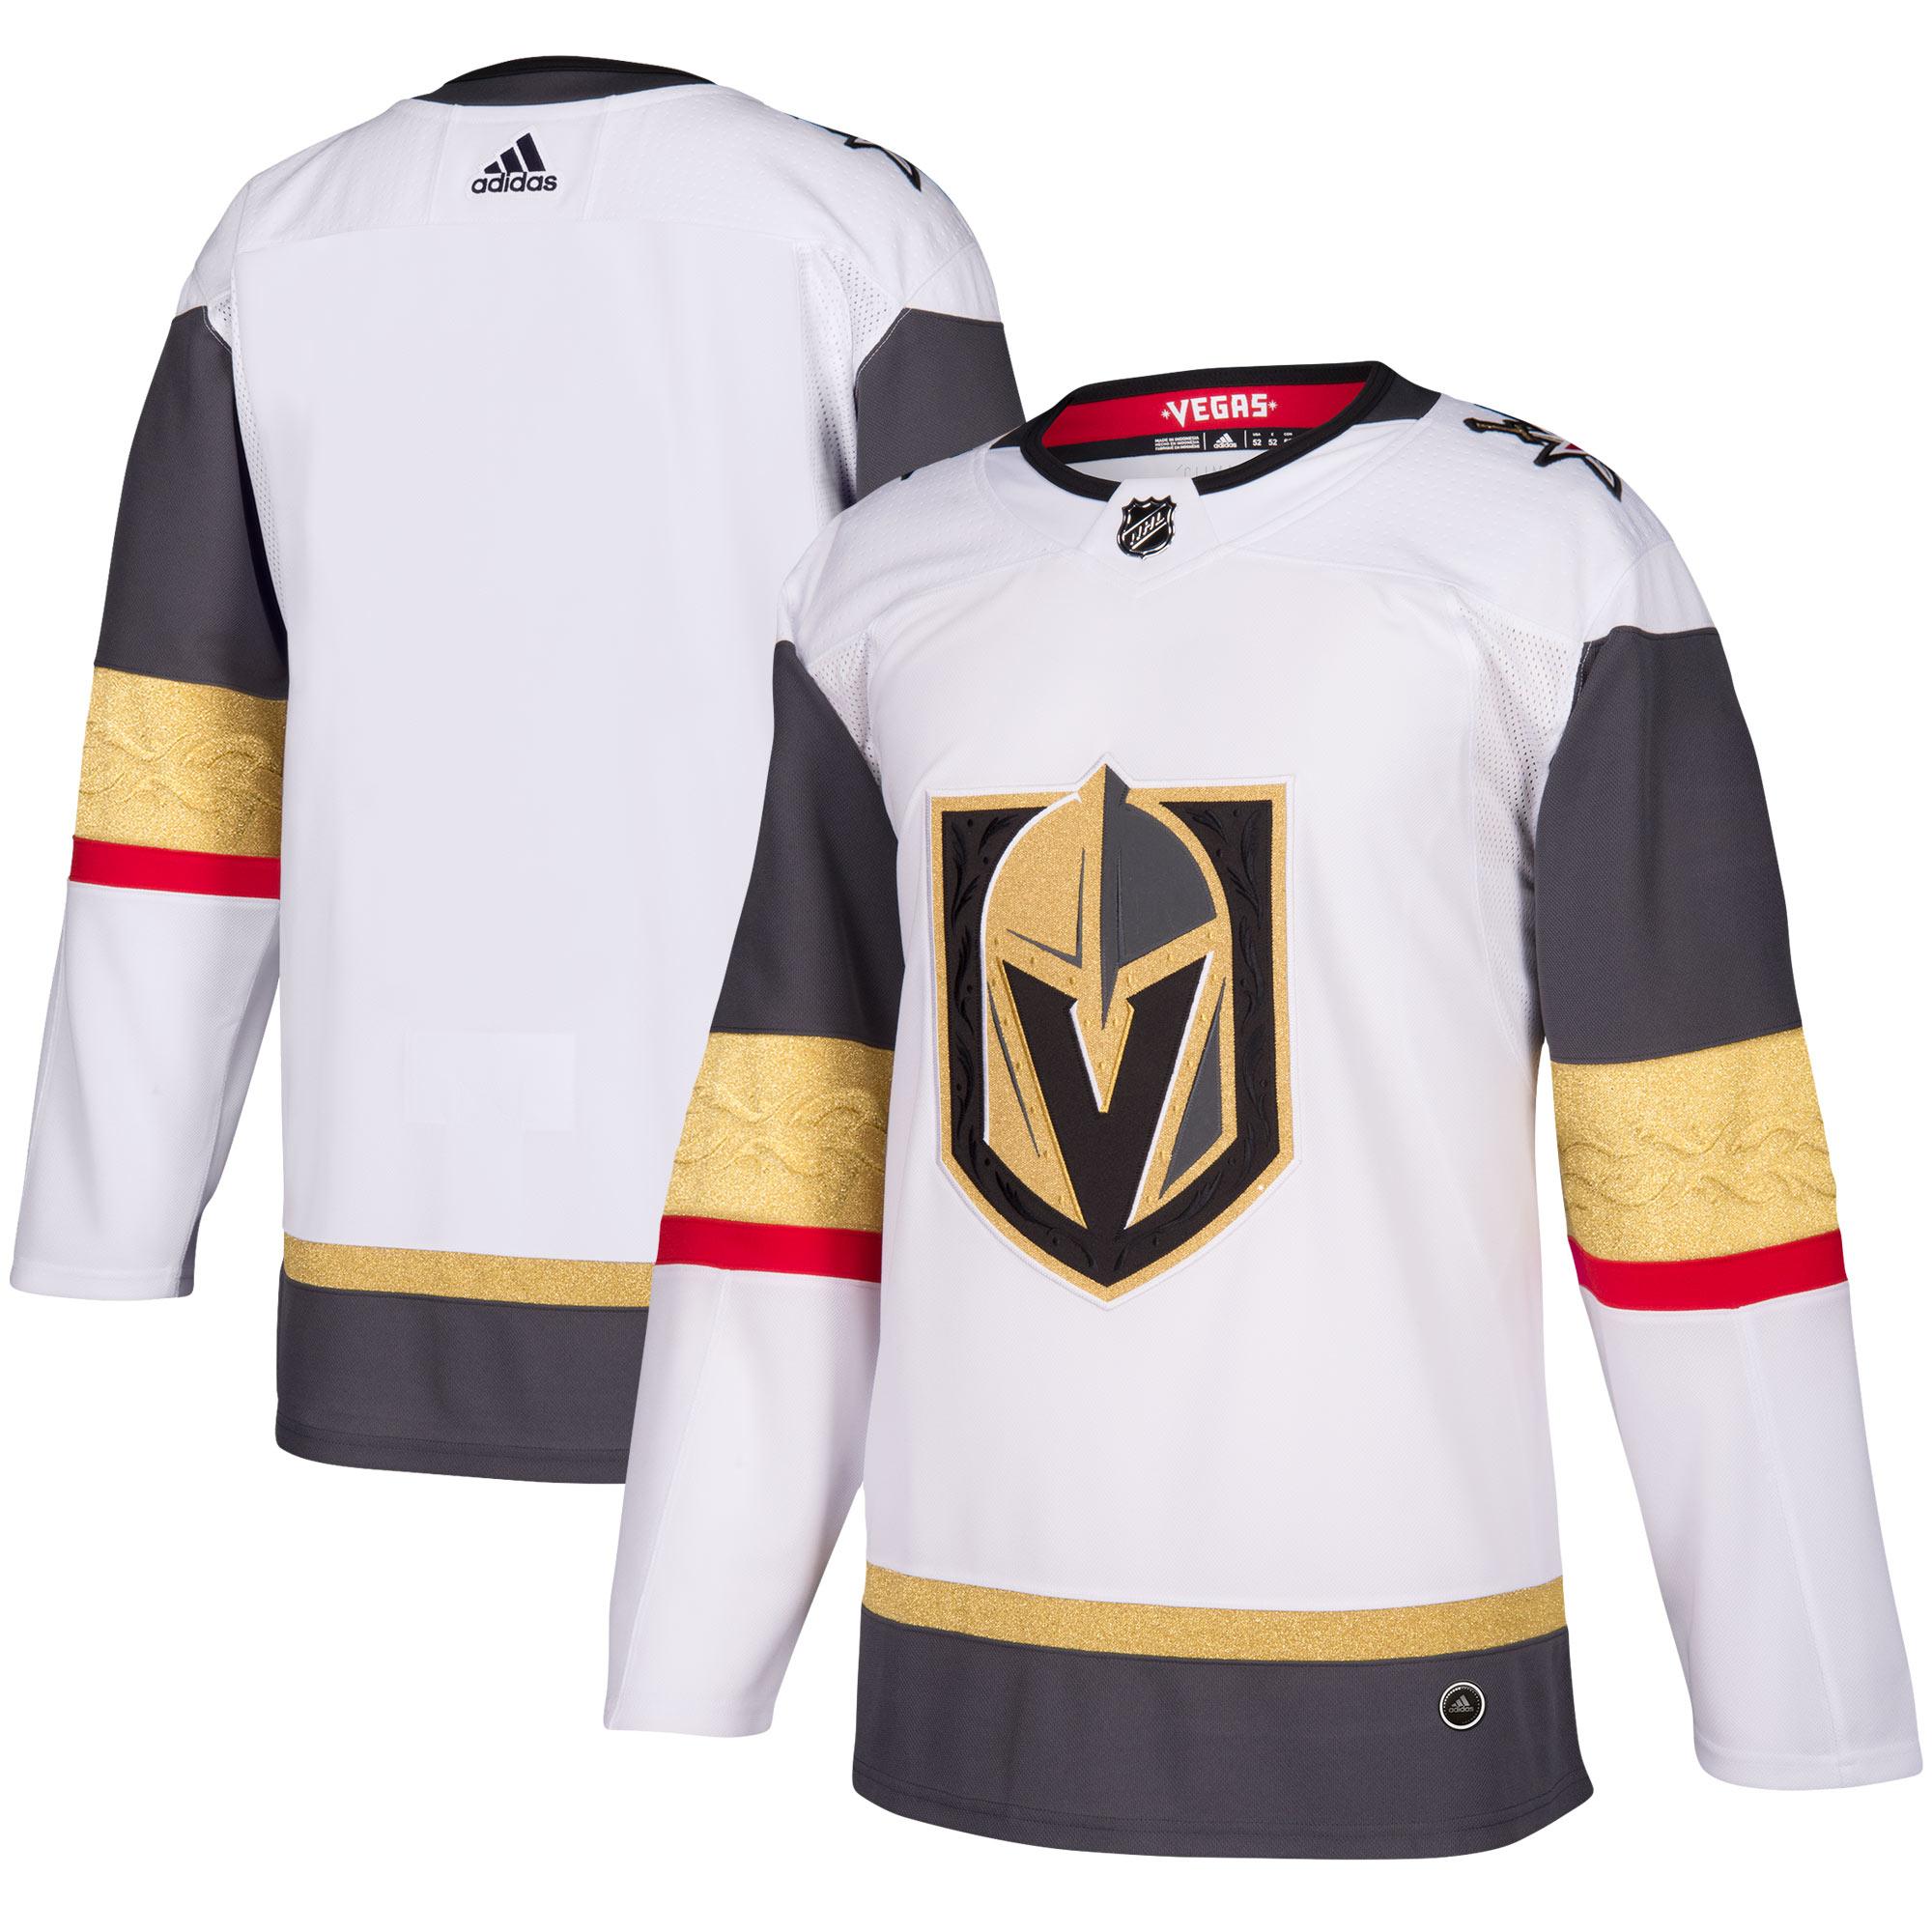 Adidas Dres Vegas Golden Knights adizero Away Authentic Pro Velikost: 52 (L)